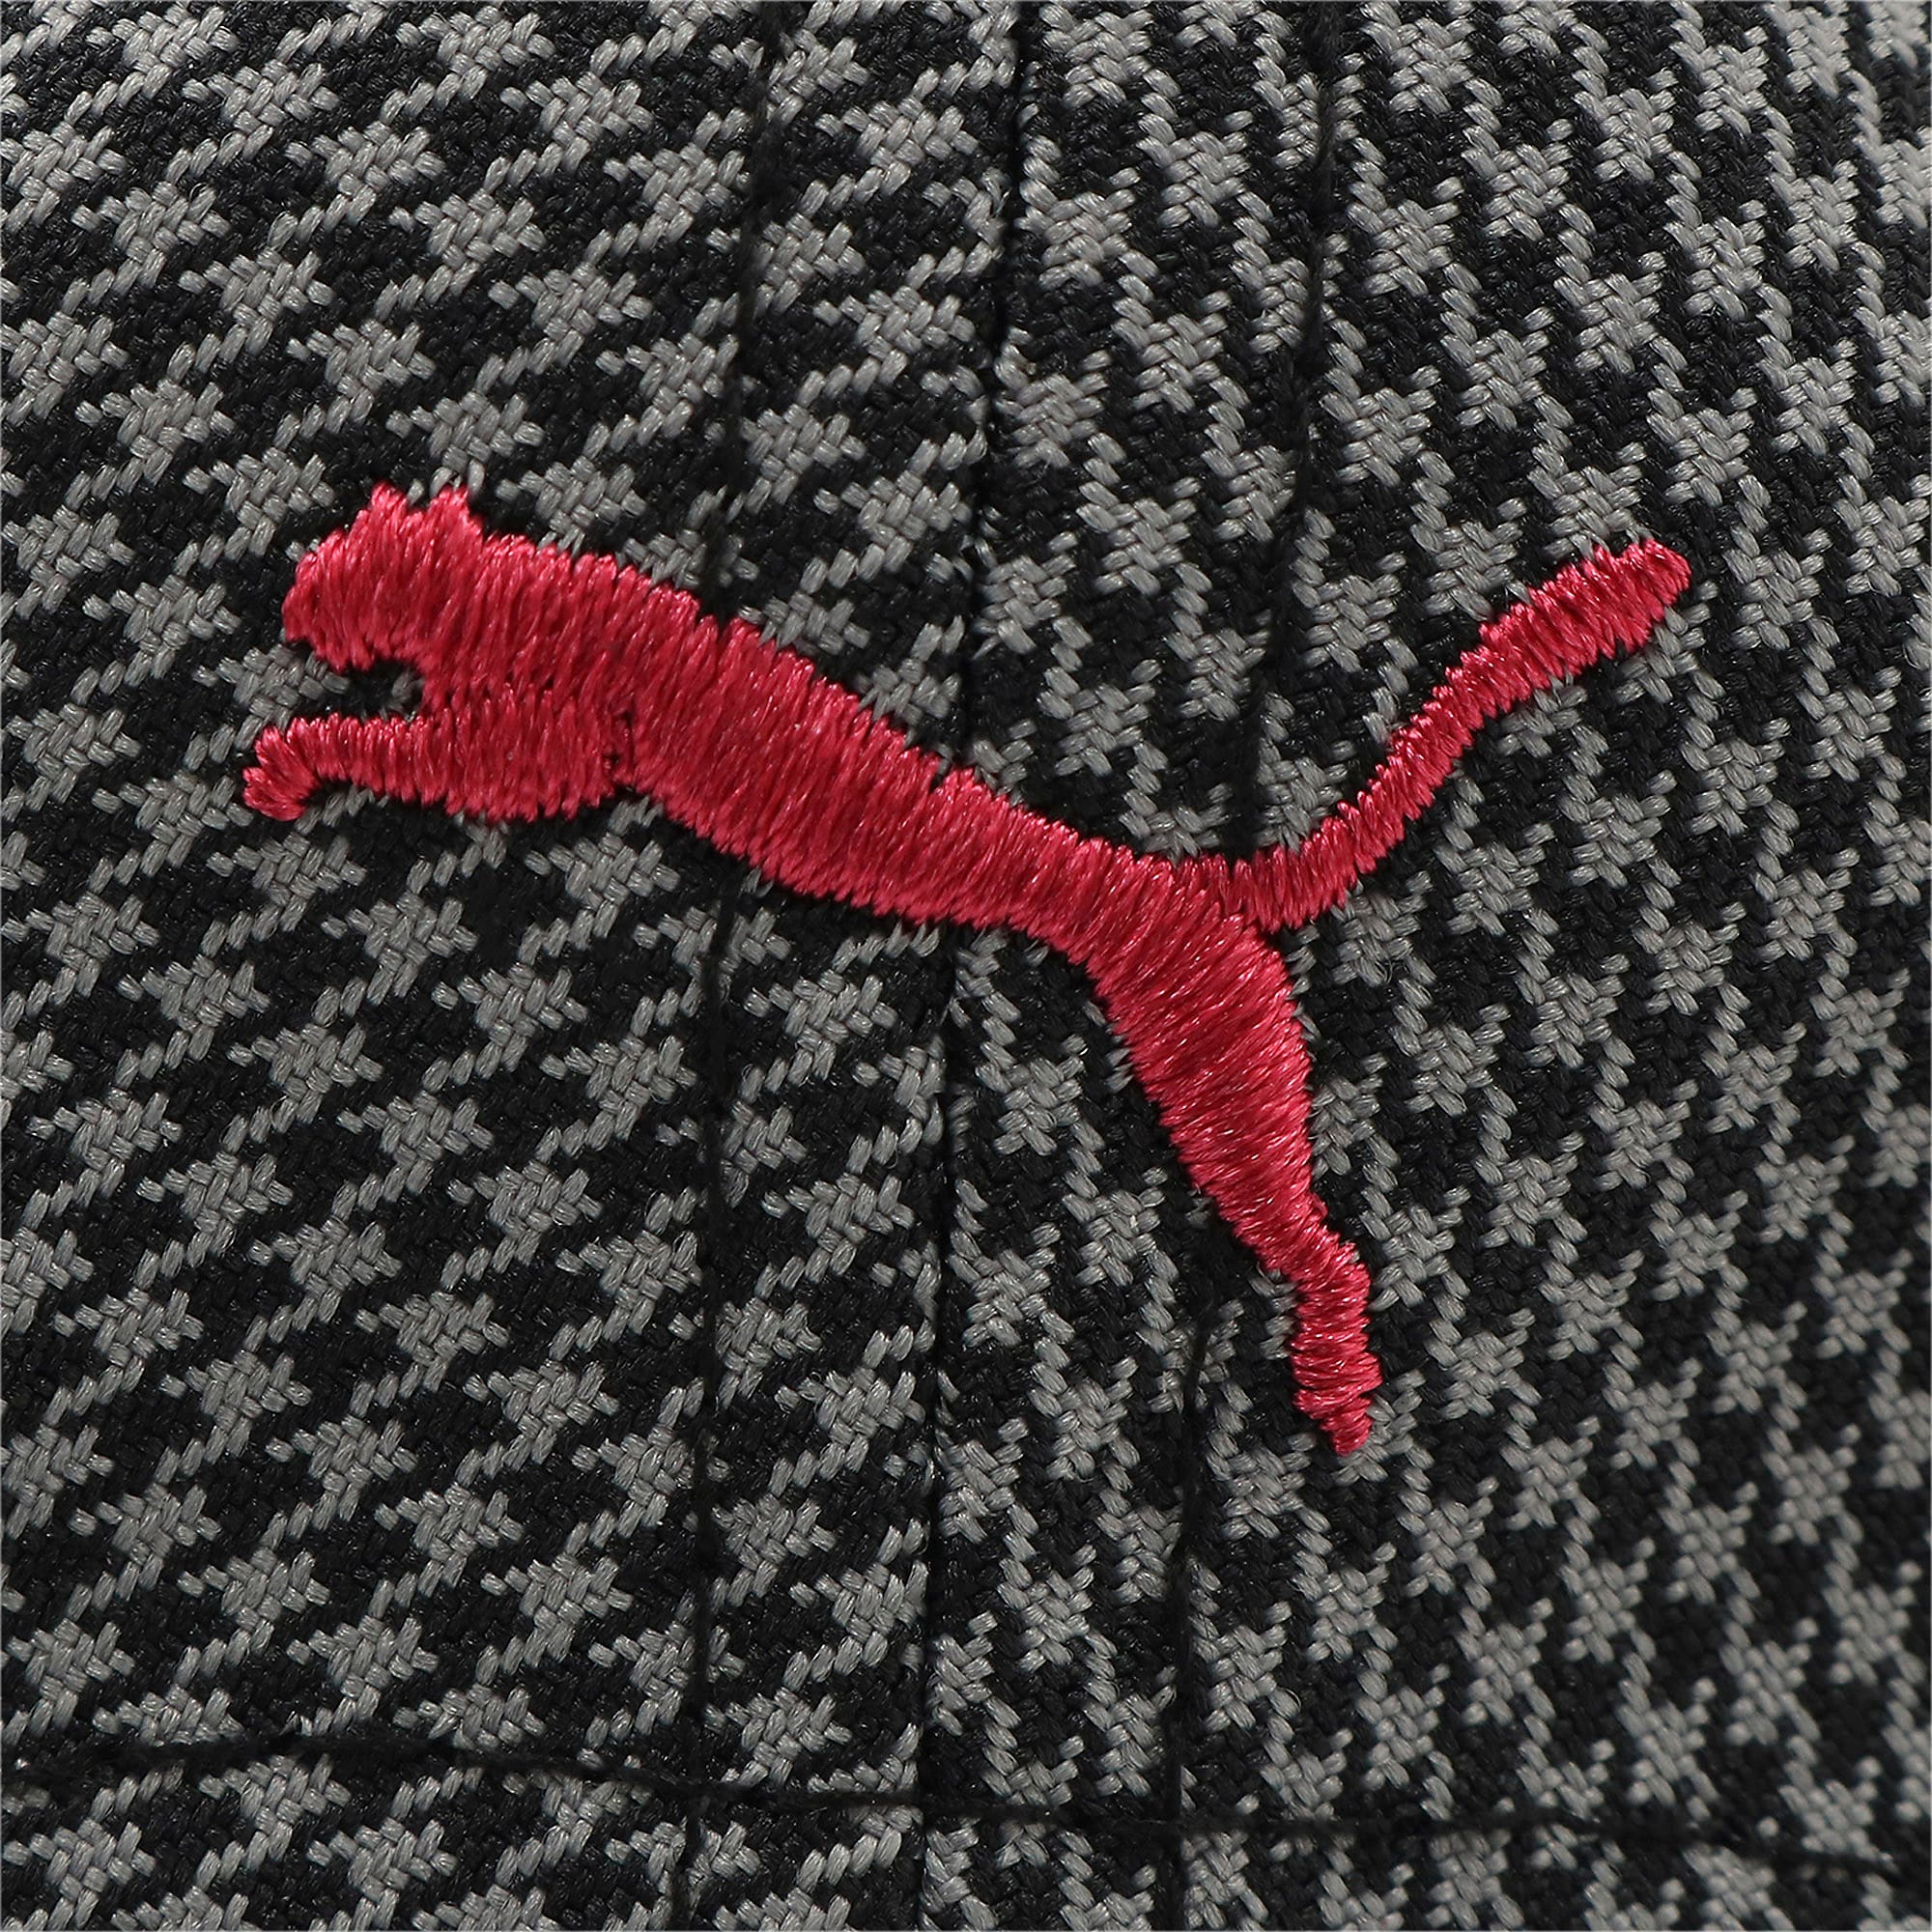 Thumbnail 3 of ゴルフ ウィメンズ Pマーク キャップ, Puma Black, medium-JPN